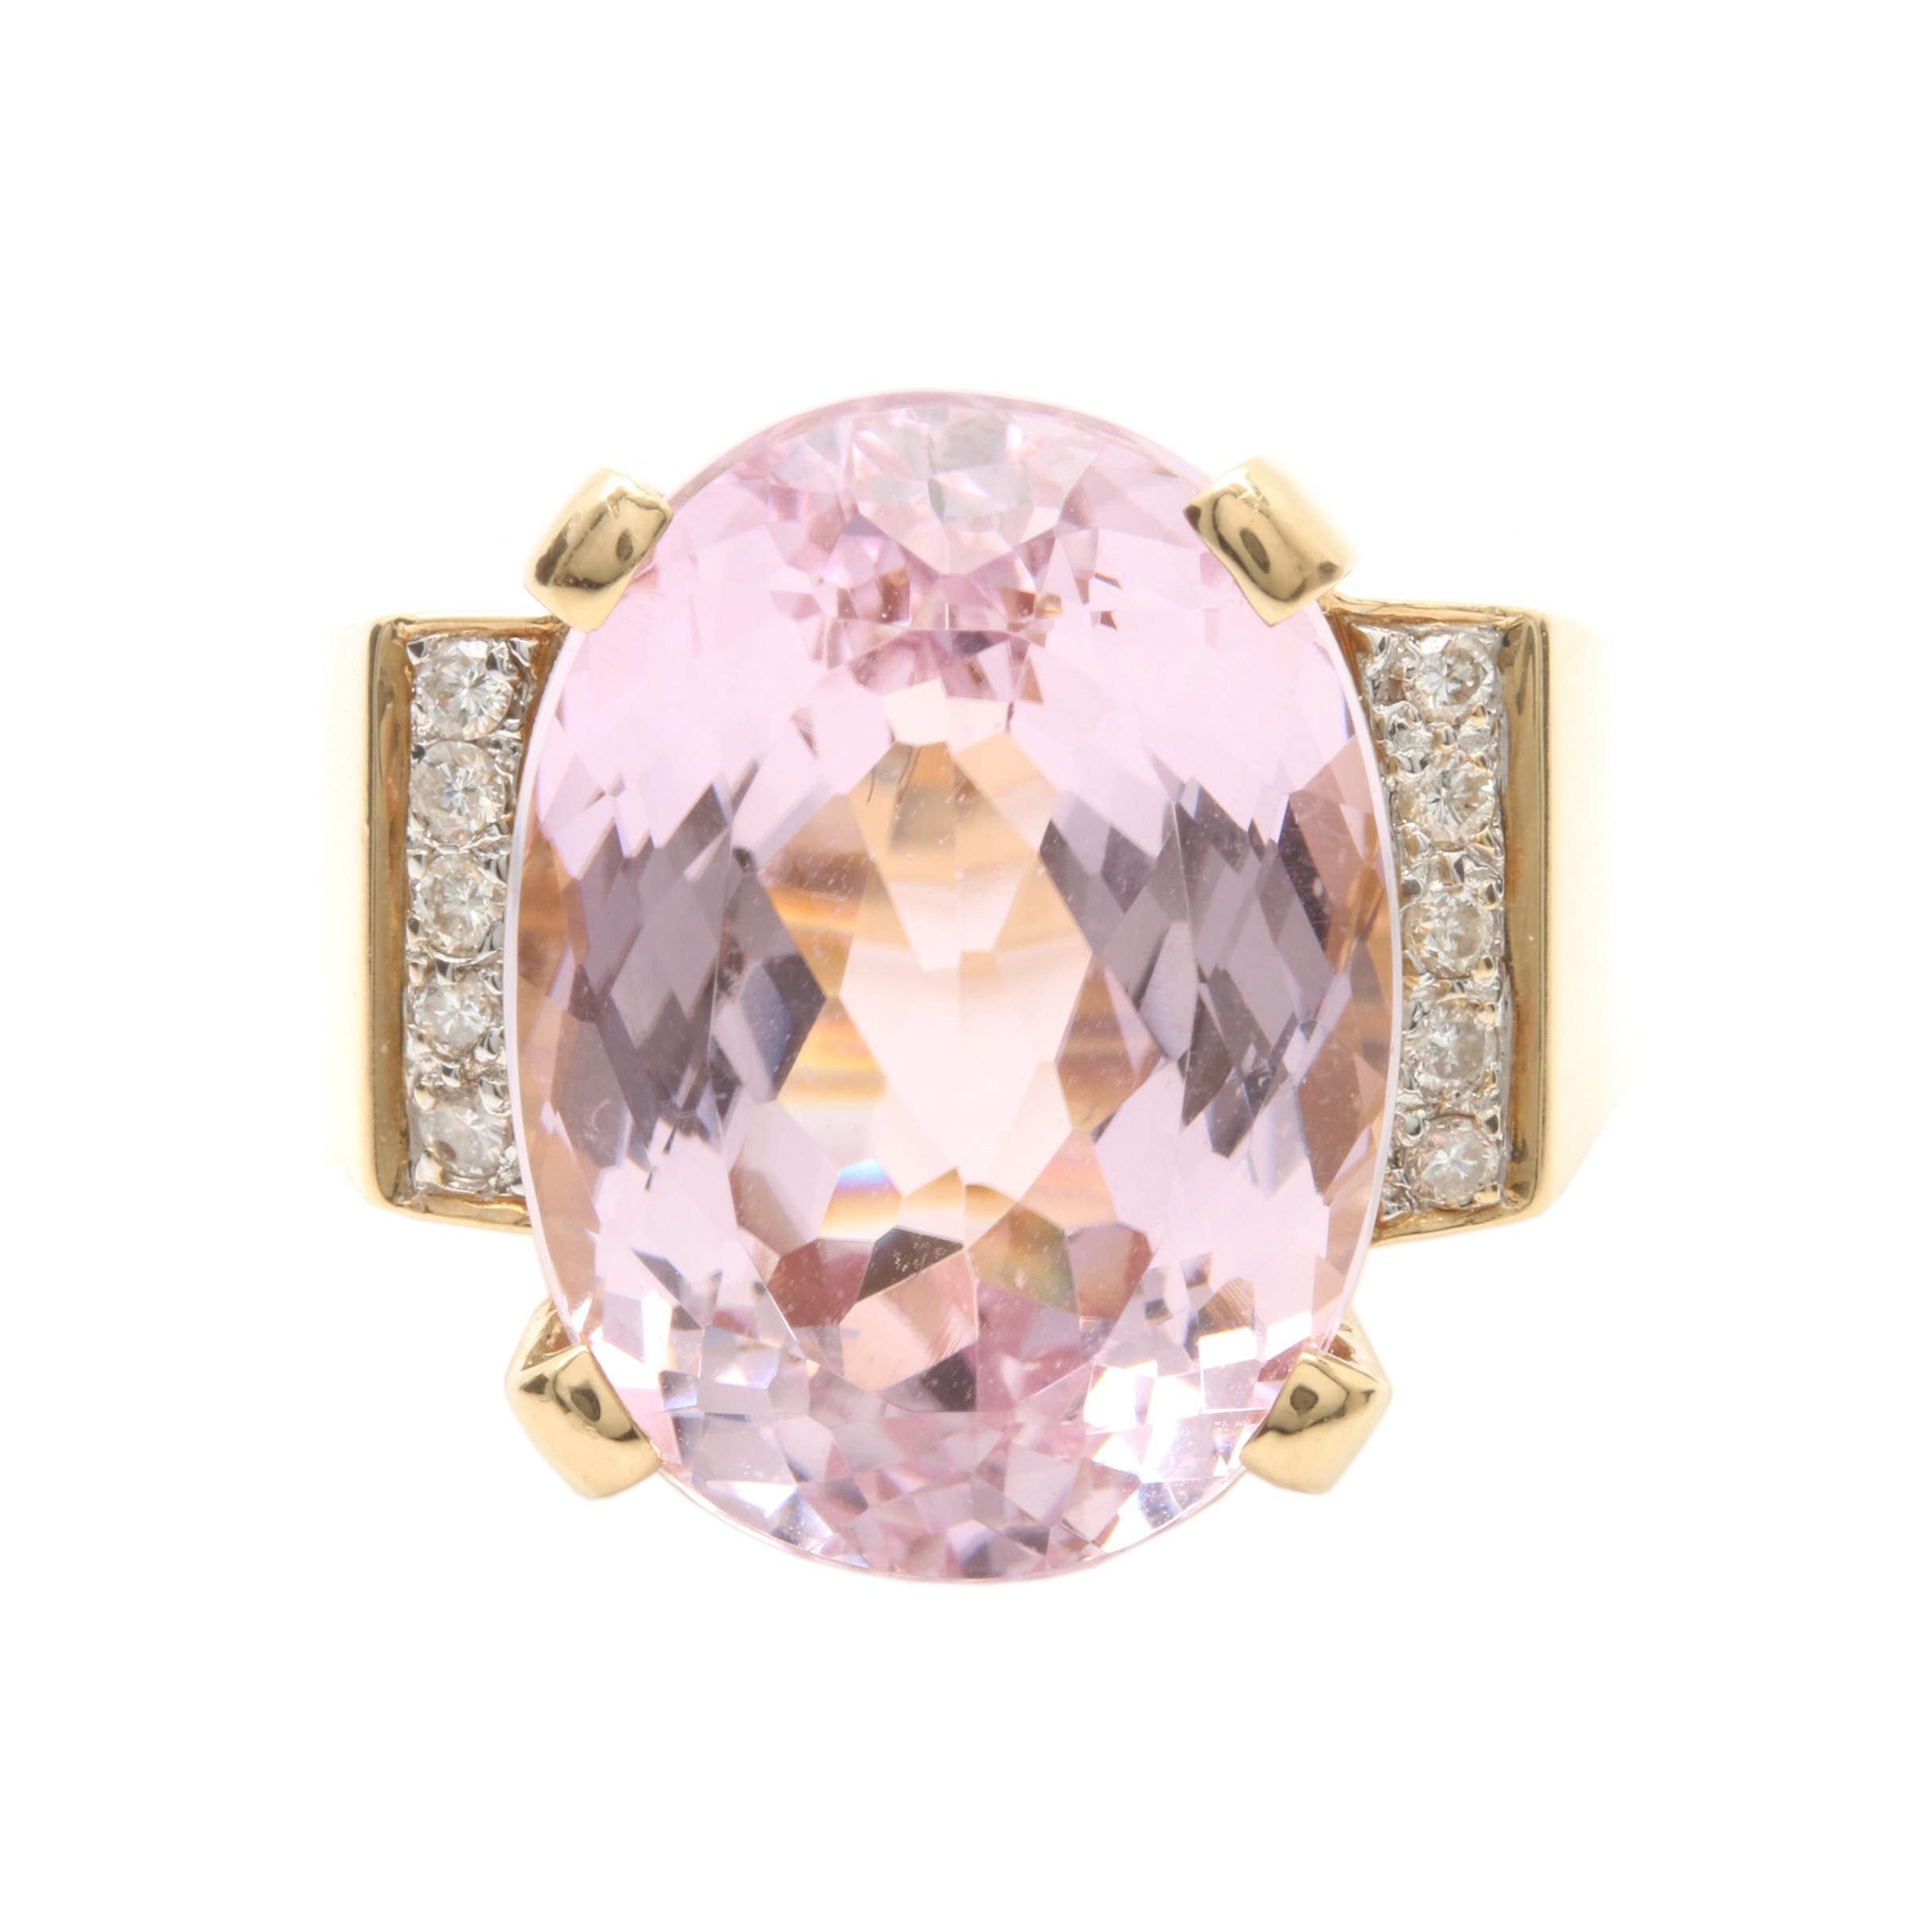 14K Yellow Gold 19.12 CT Pink Kunzite and Diamond Ring